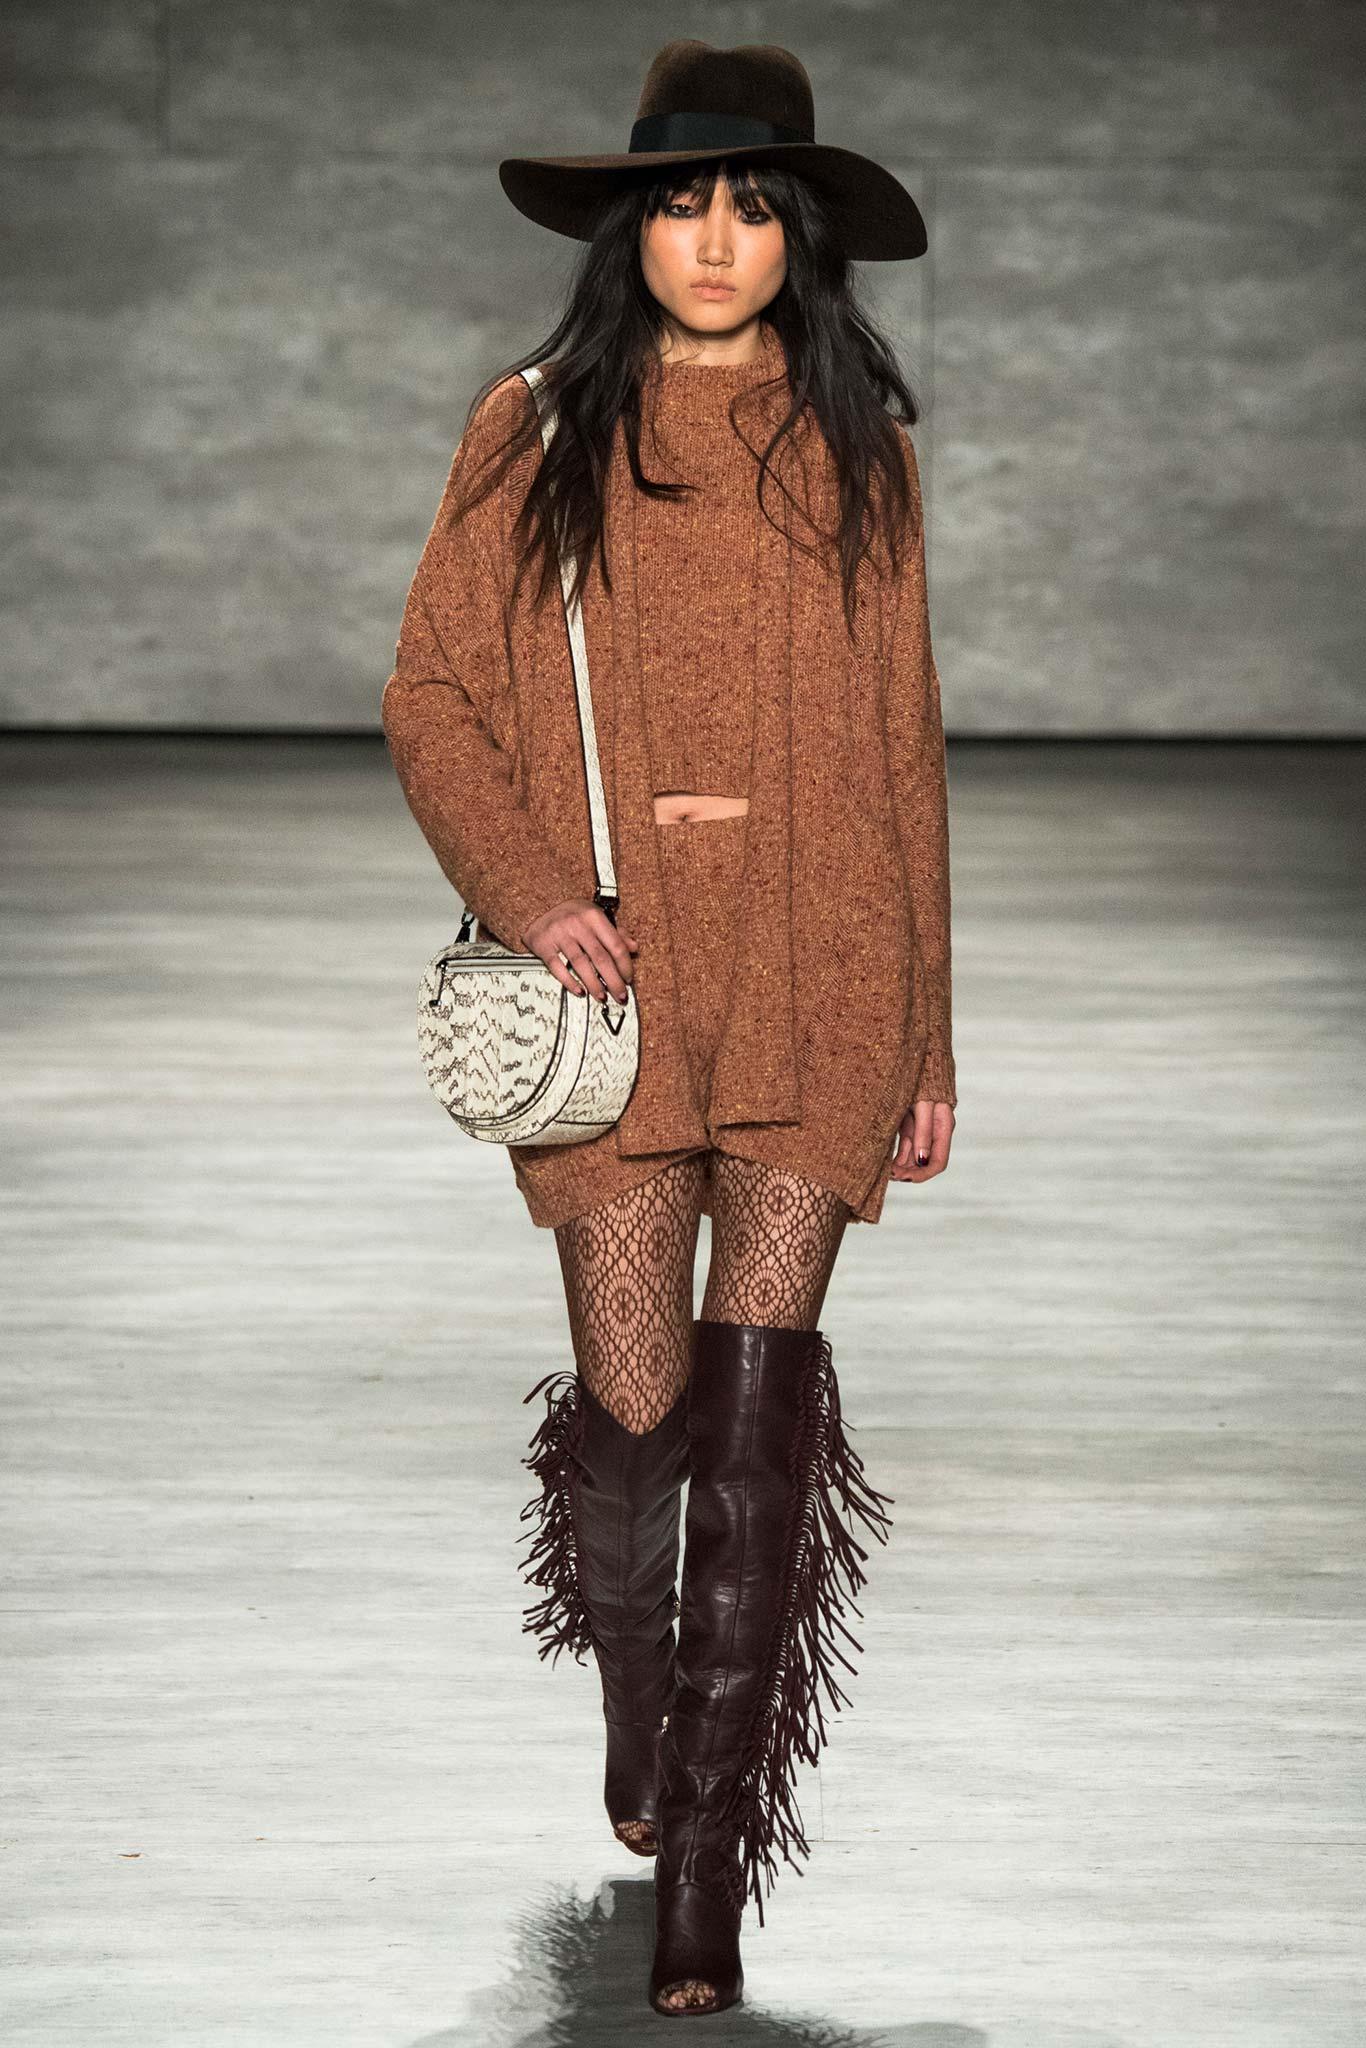 Rebecca Minkoff Fall 2015 Ready-to-Wear Look 15 Photo: Yannis Vlamos / Indigitalimages.com   Style.com   Fall 2015 RTW Runway Looks